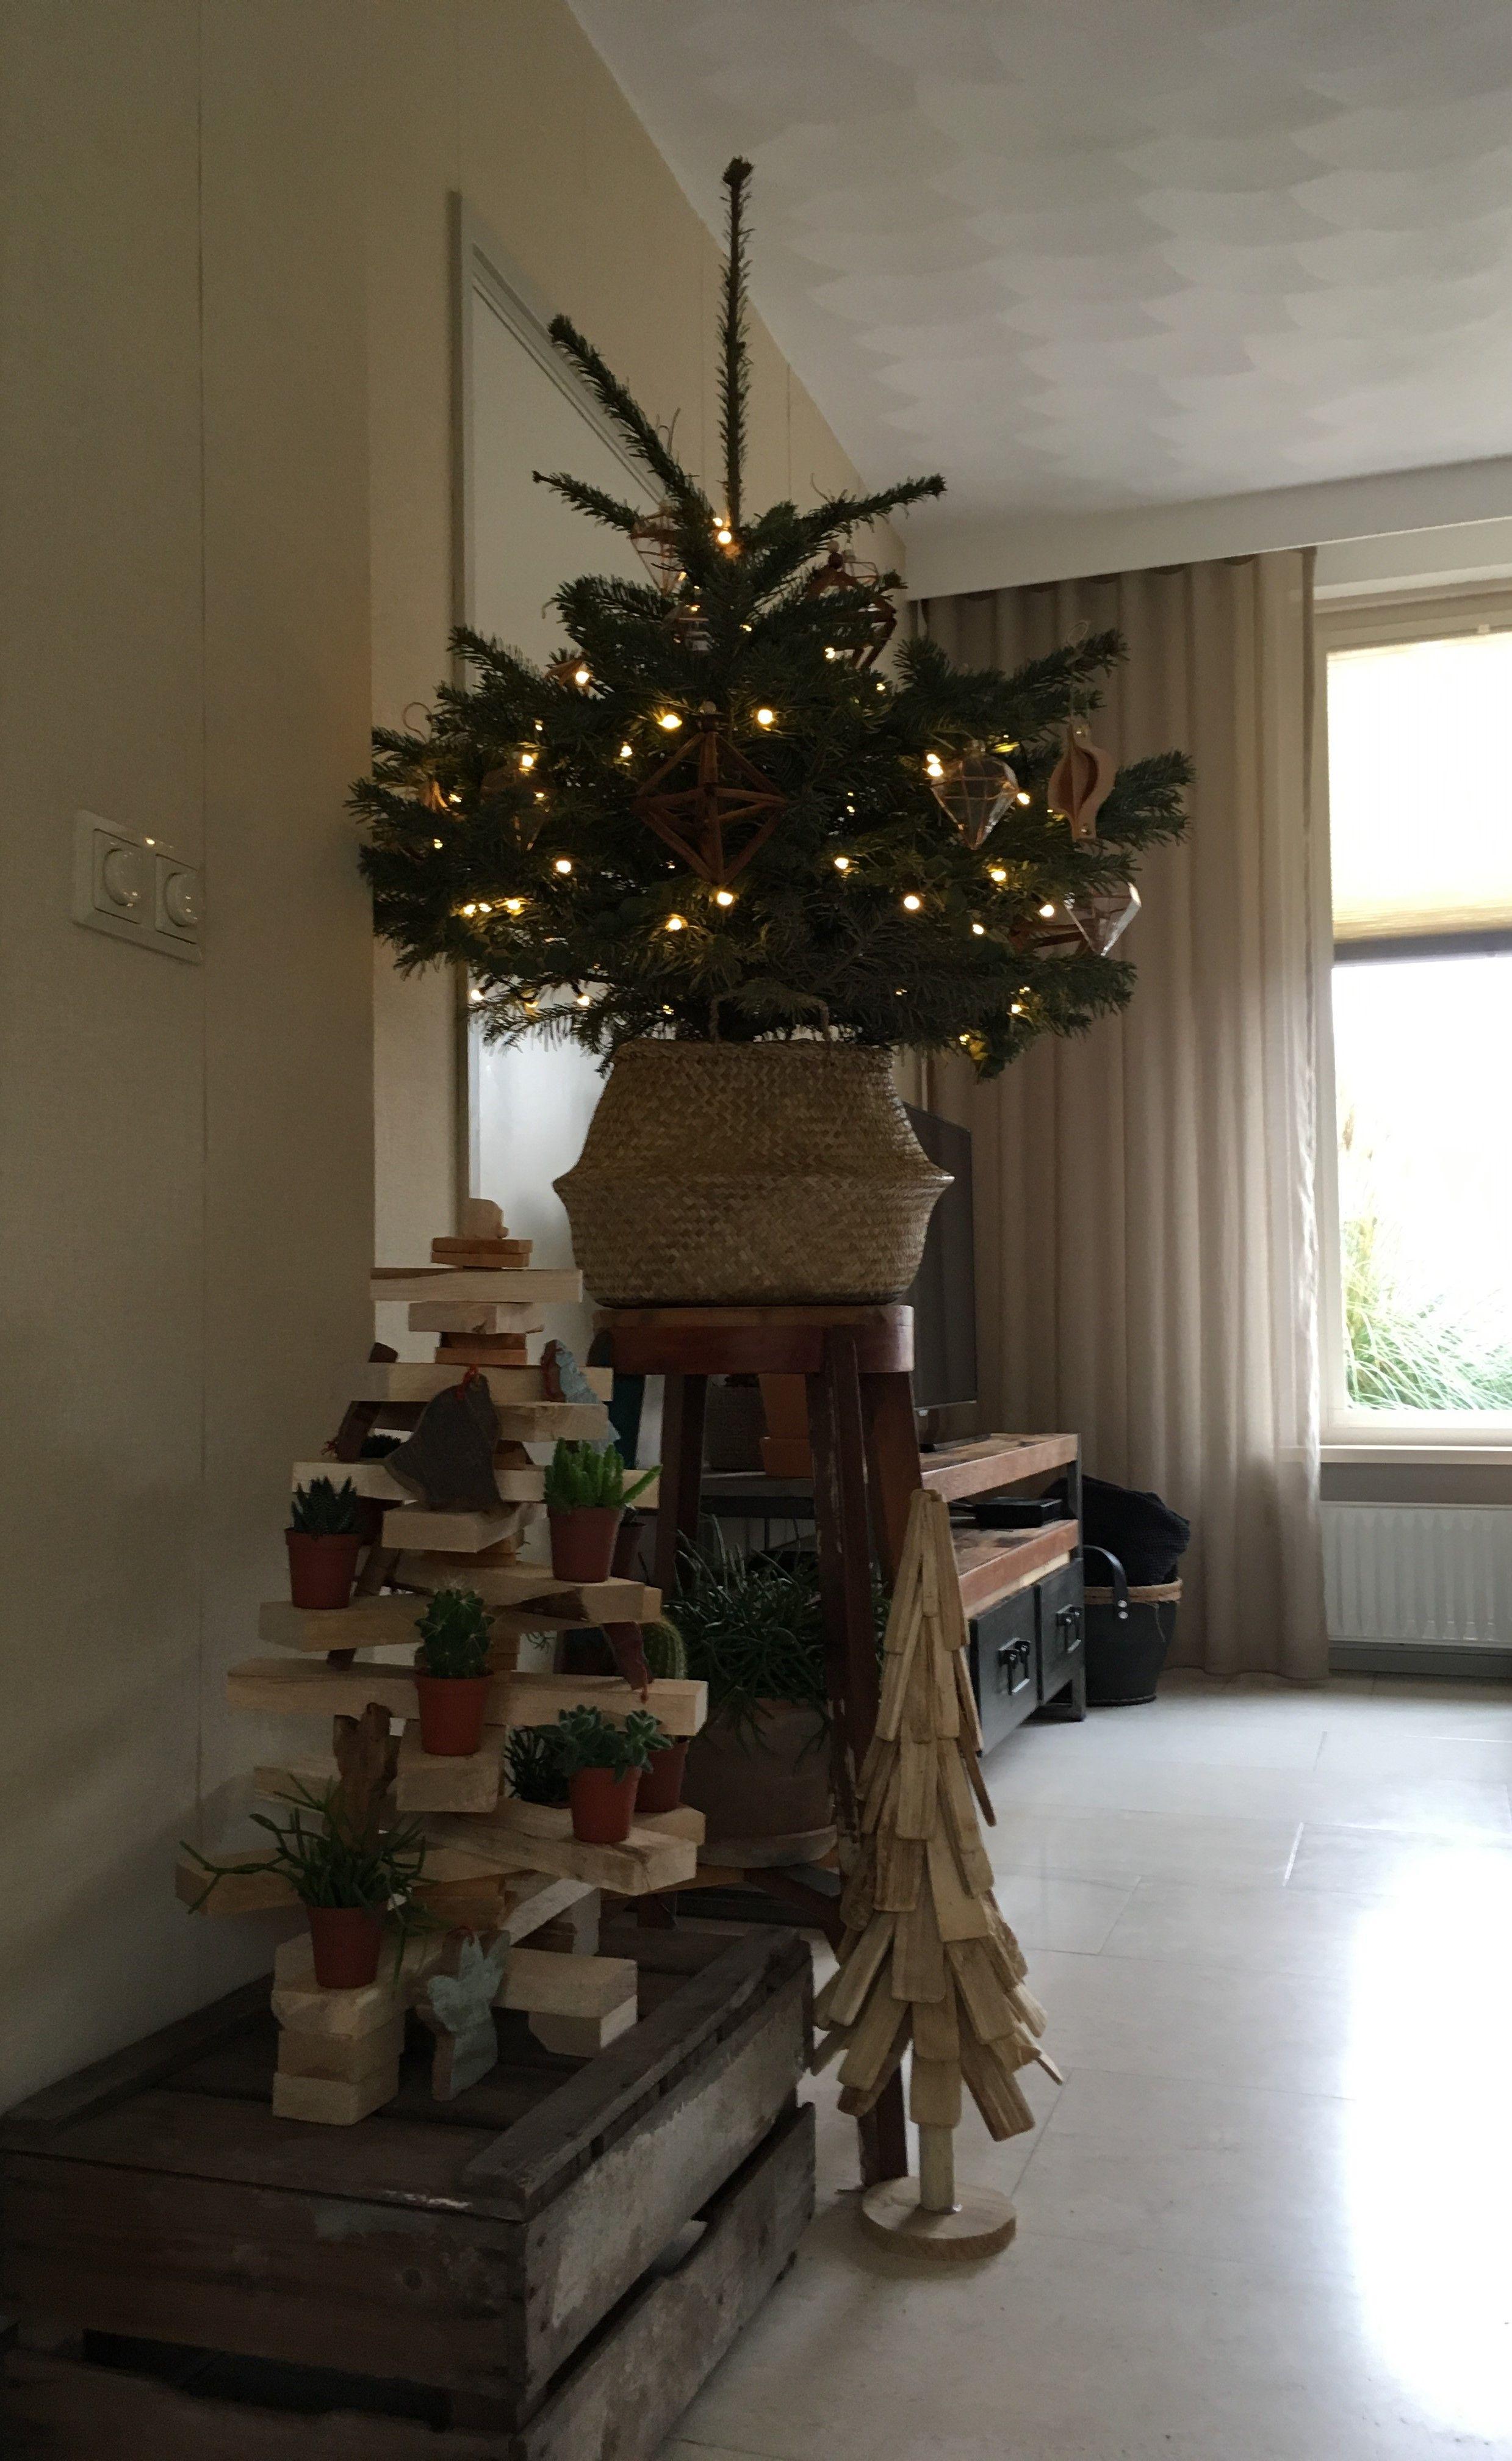 Kleine Nordmann Kerstboom In Ikea Mand Op Hoge Kruk